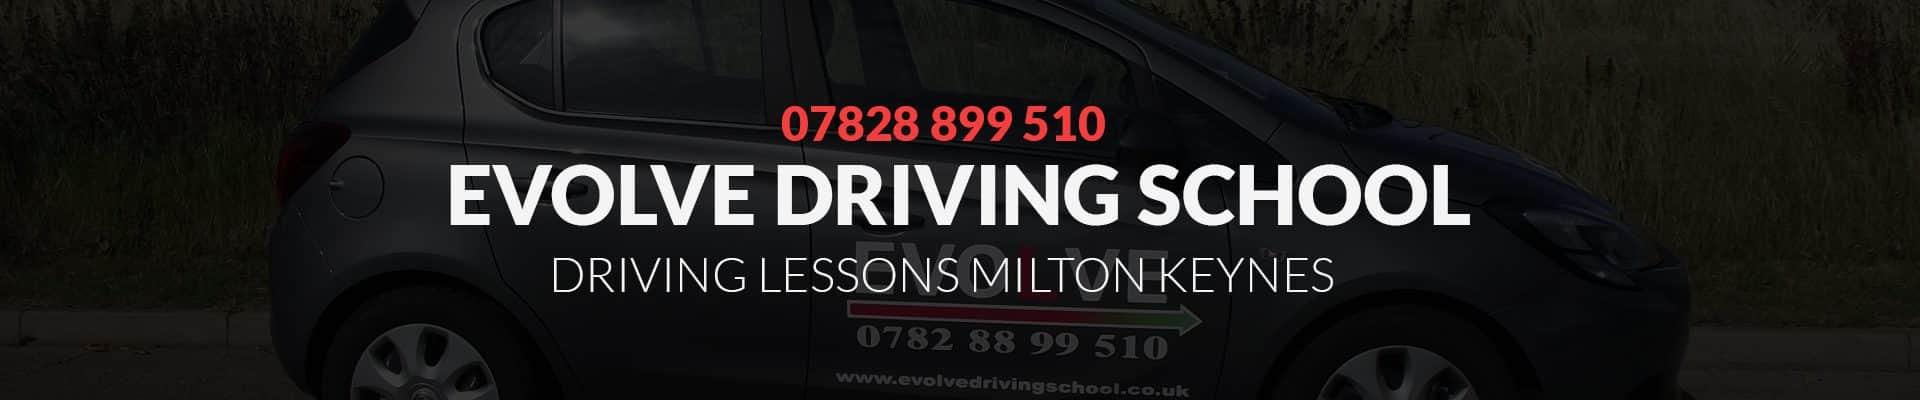 driving school milton keynes banner